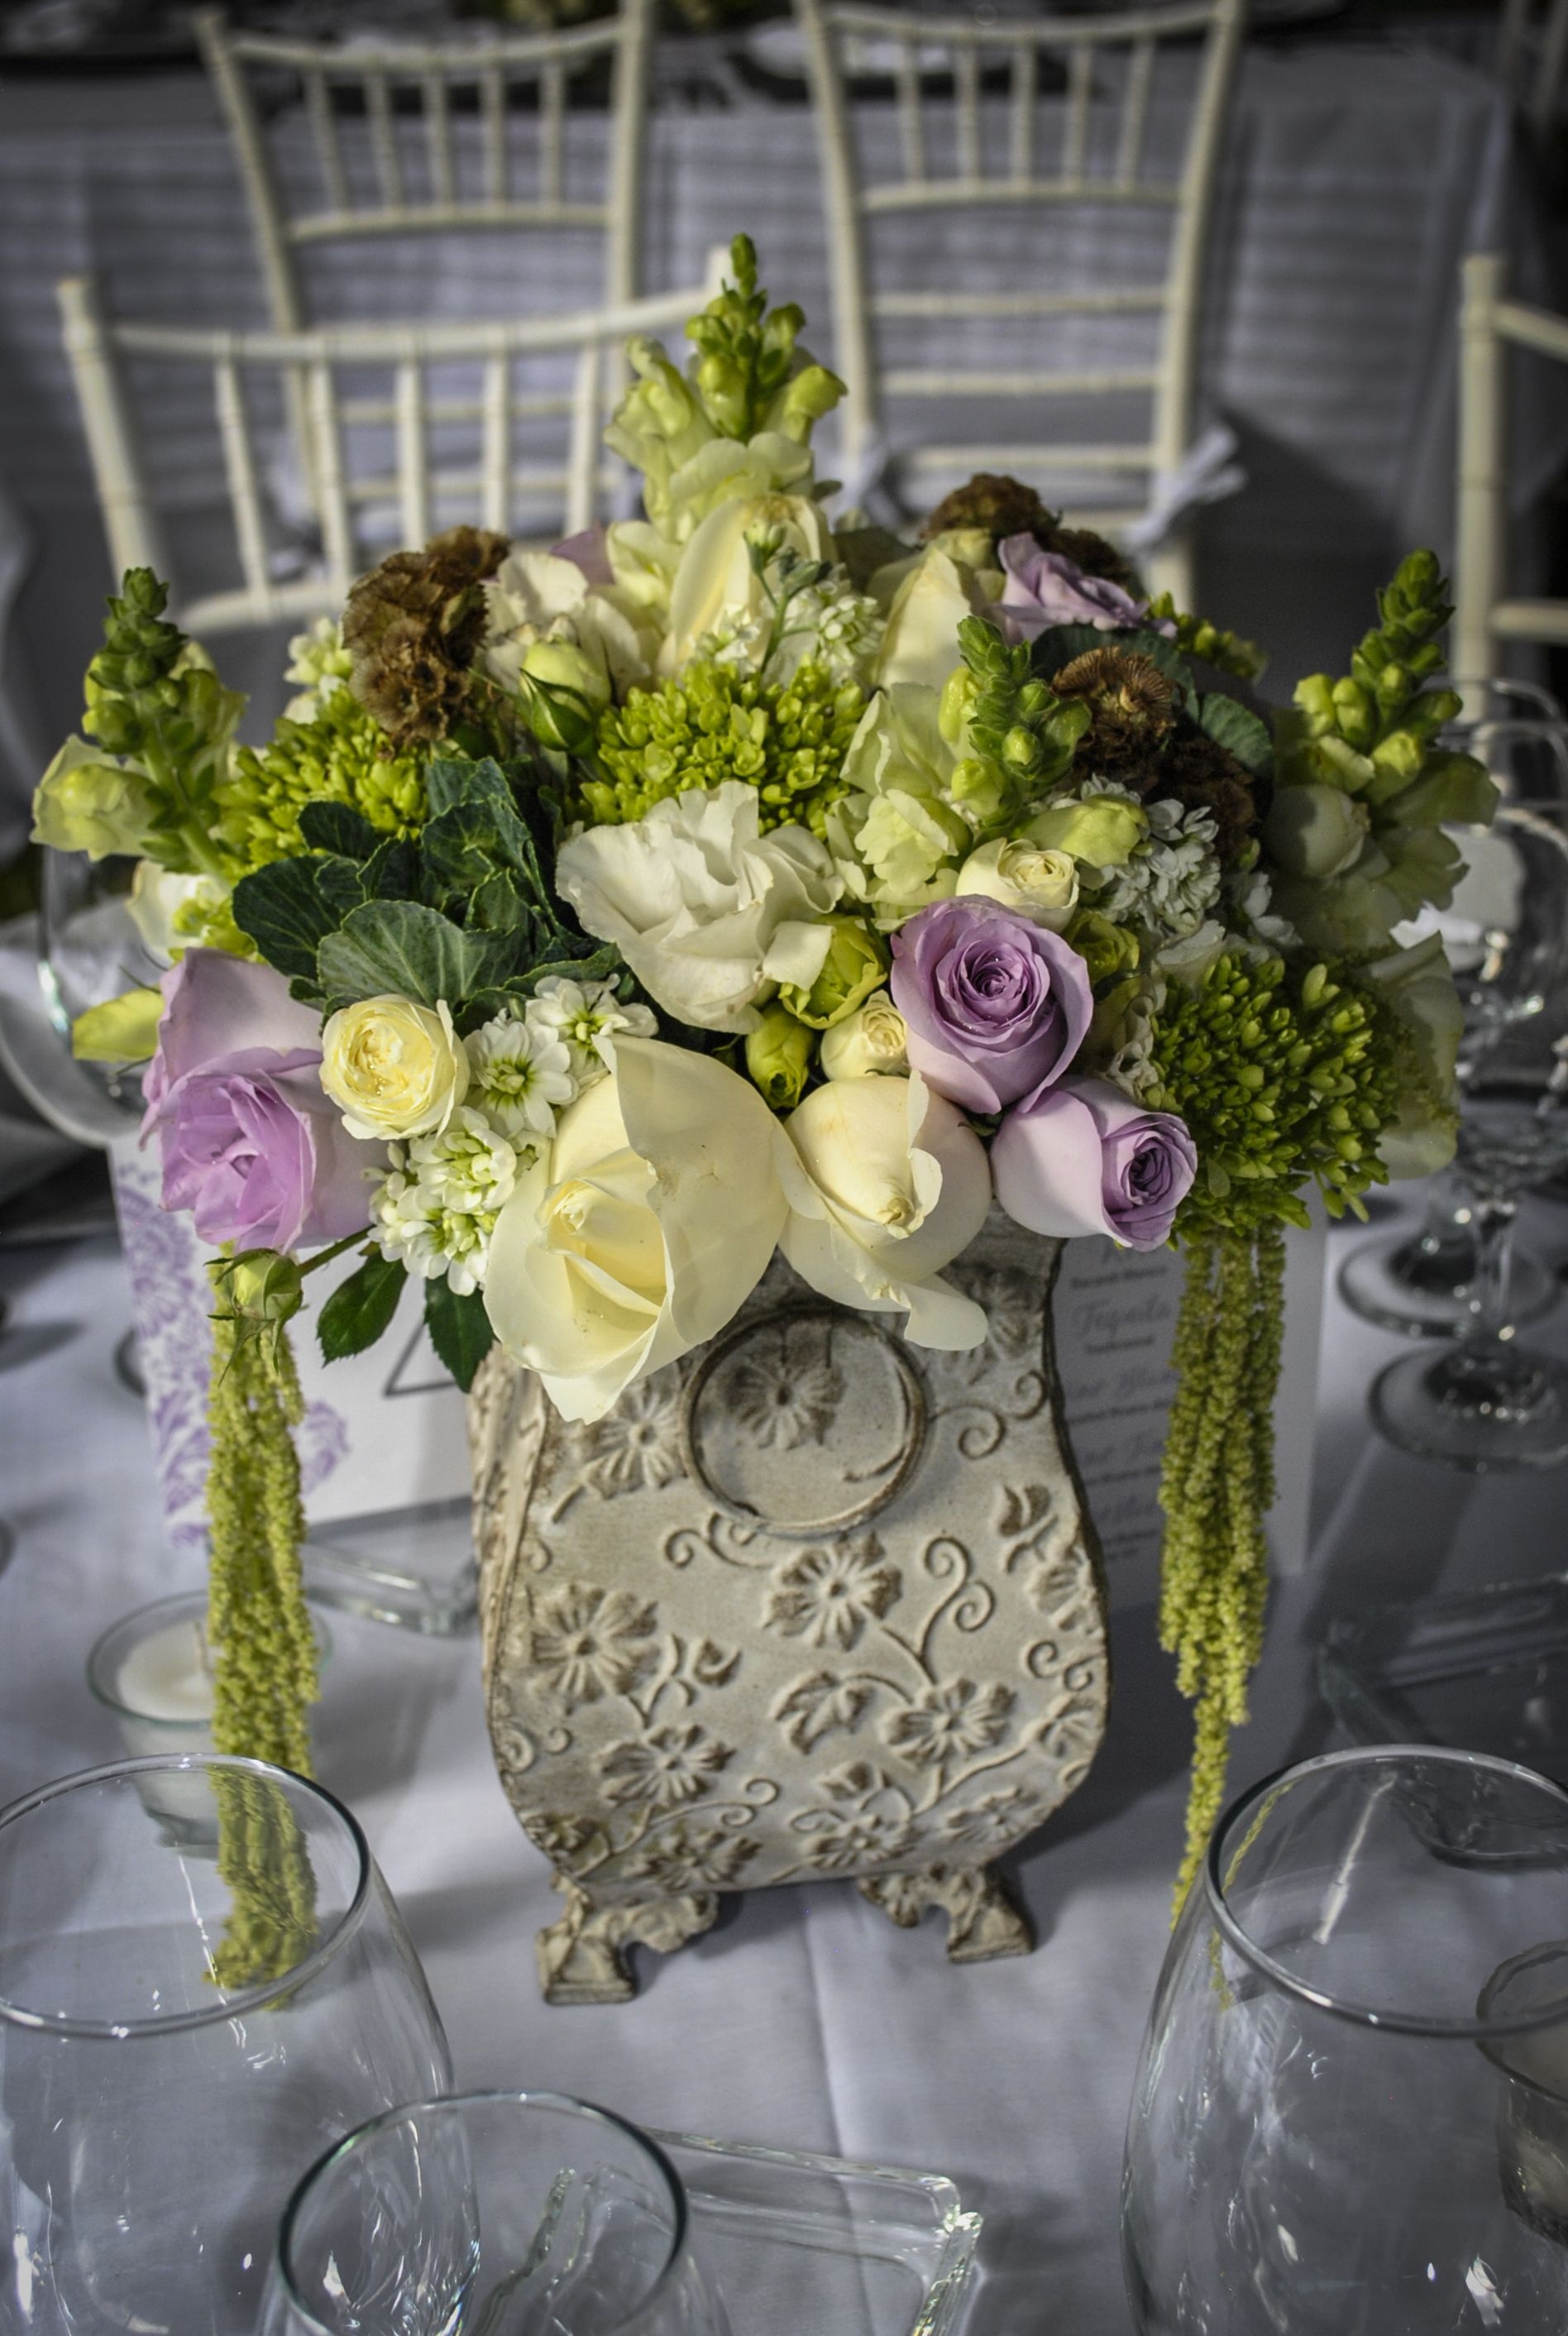 Arreglo Floral Para Bodas Hermosos Detalles Rosas Colores